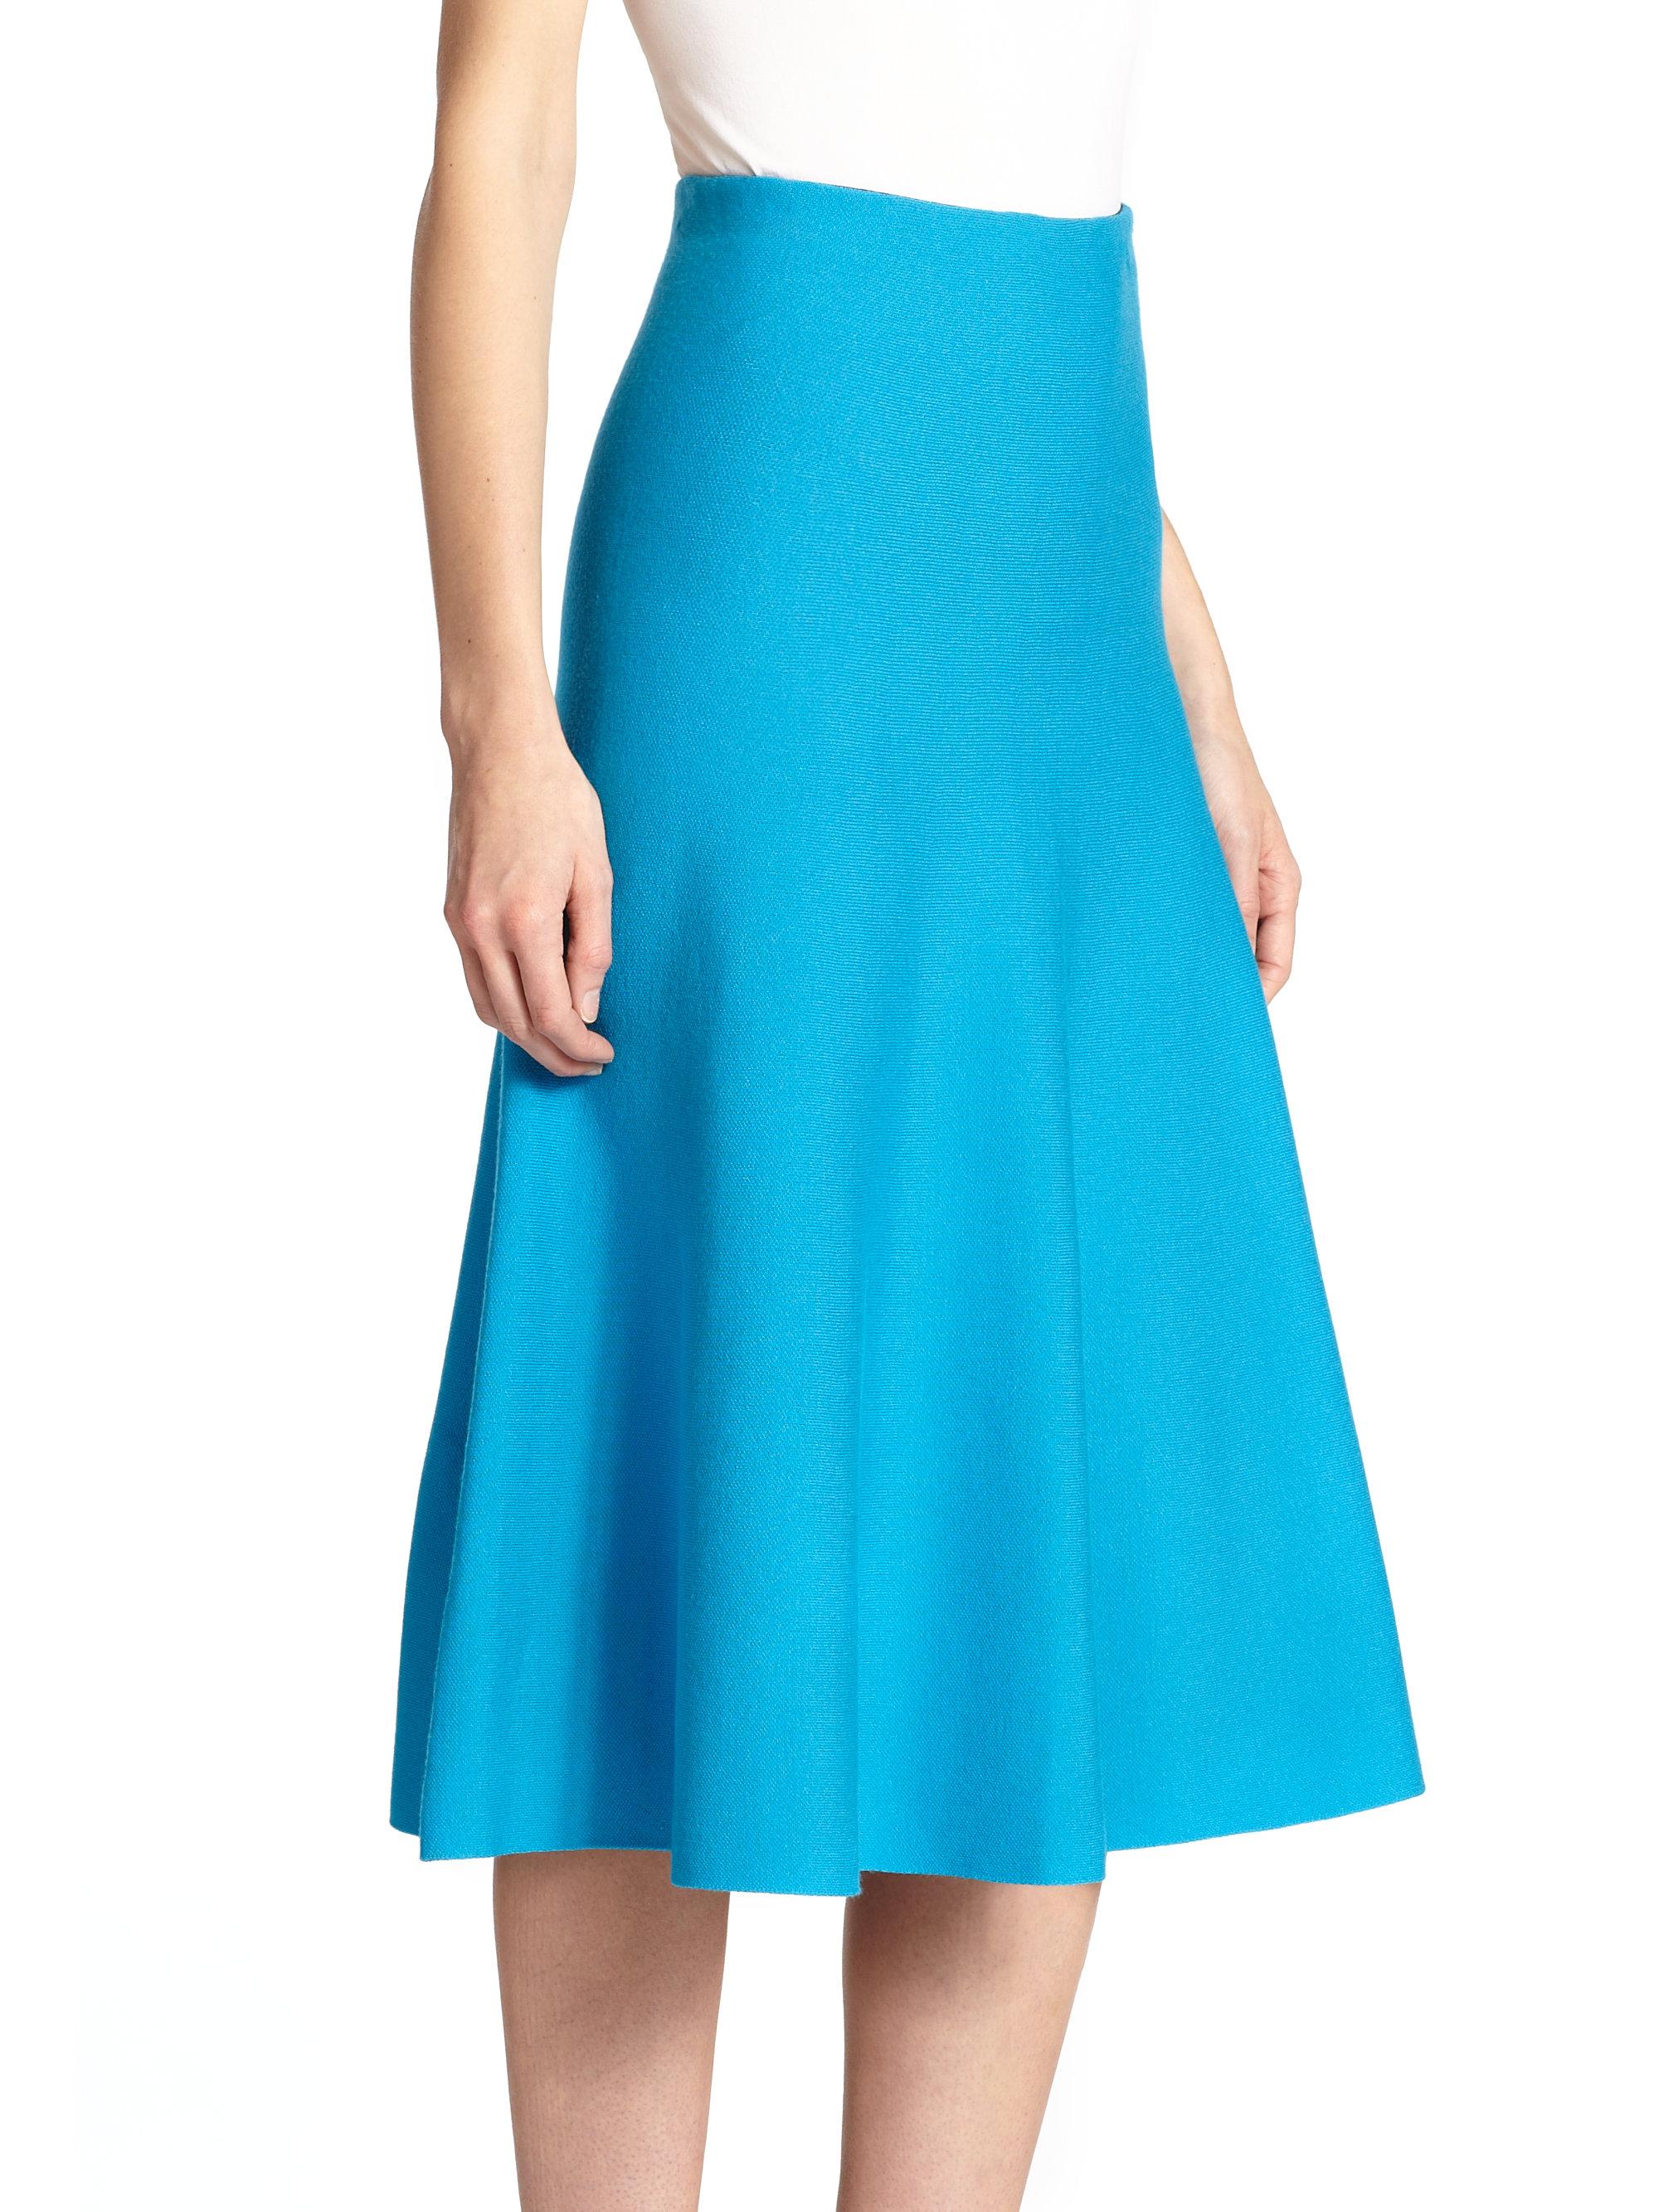 Rvn Knit Circular Midi Skirt in Blue | Lyst